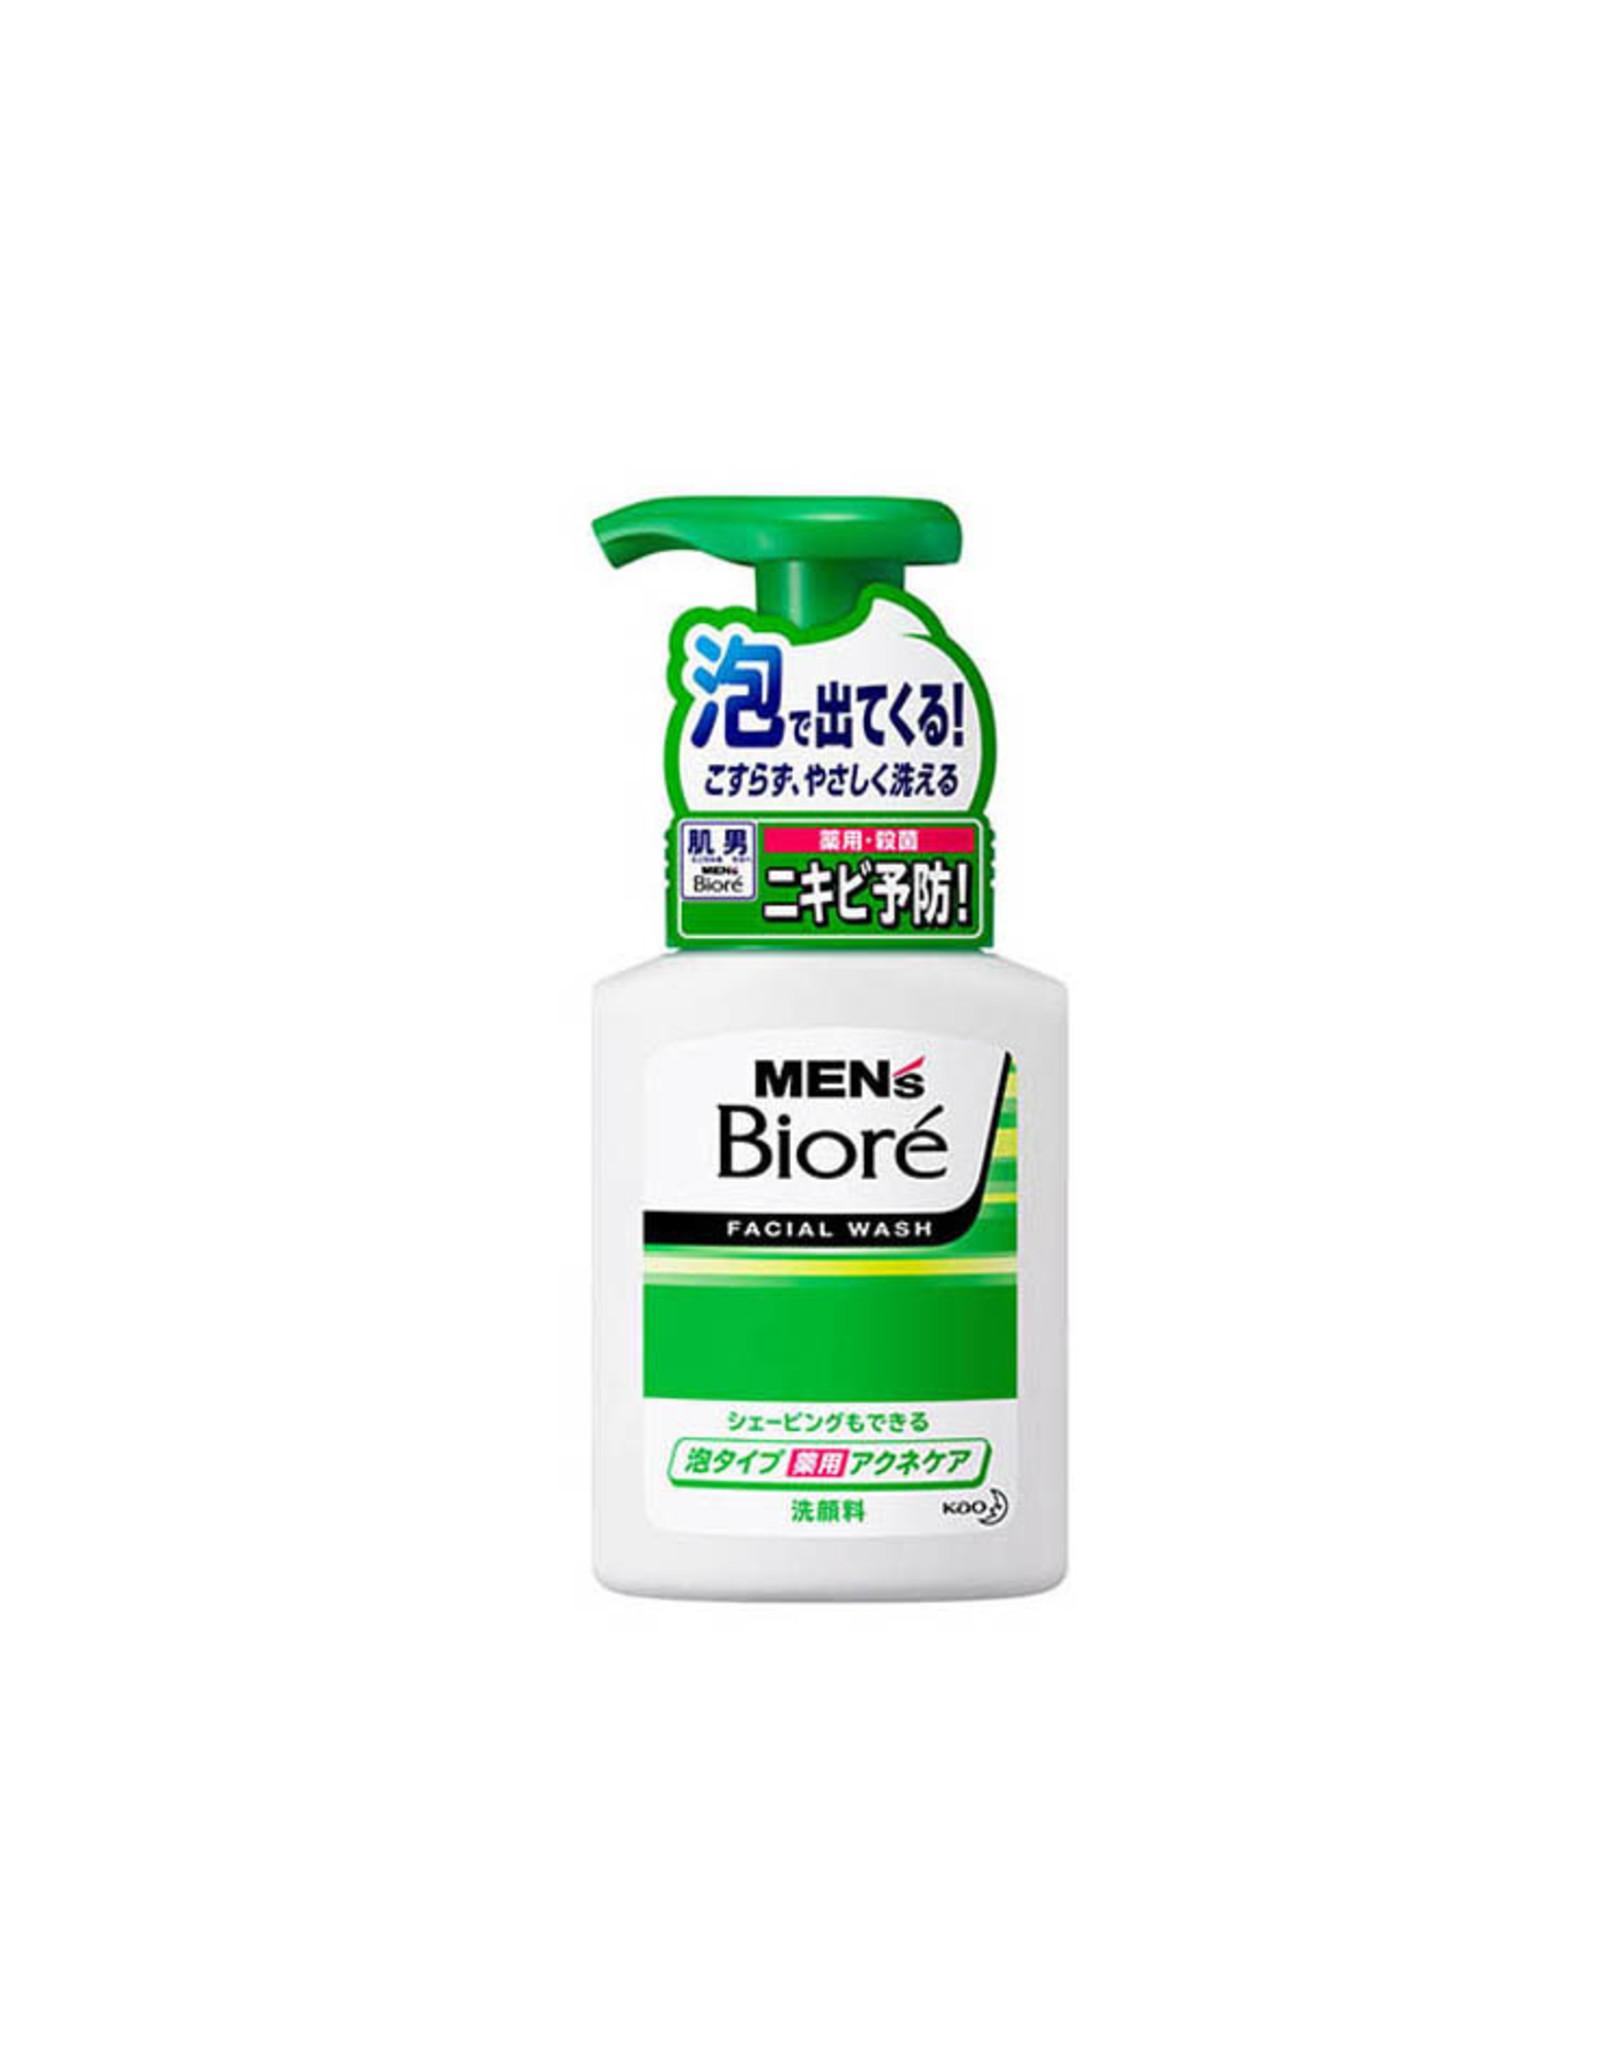 Biore Men's Face Wash Foam Type 150ml